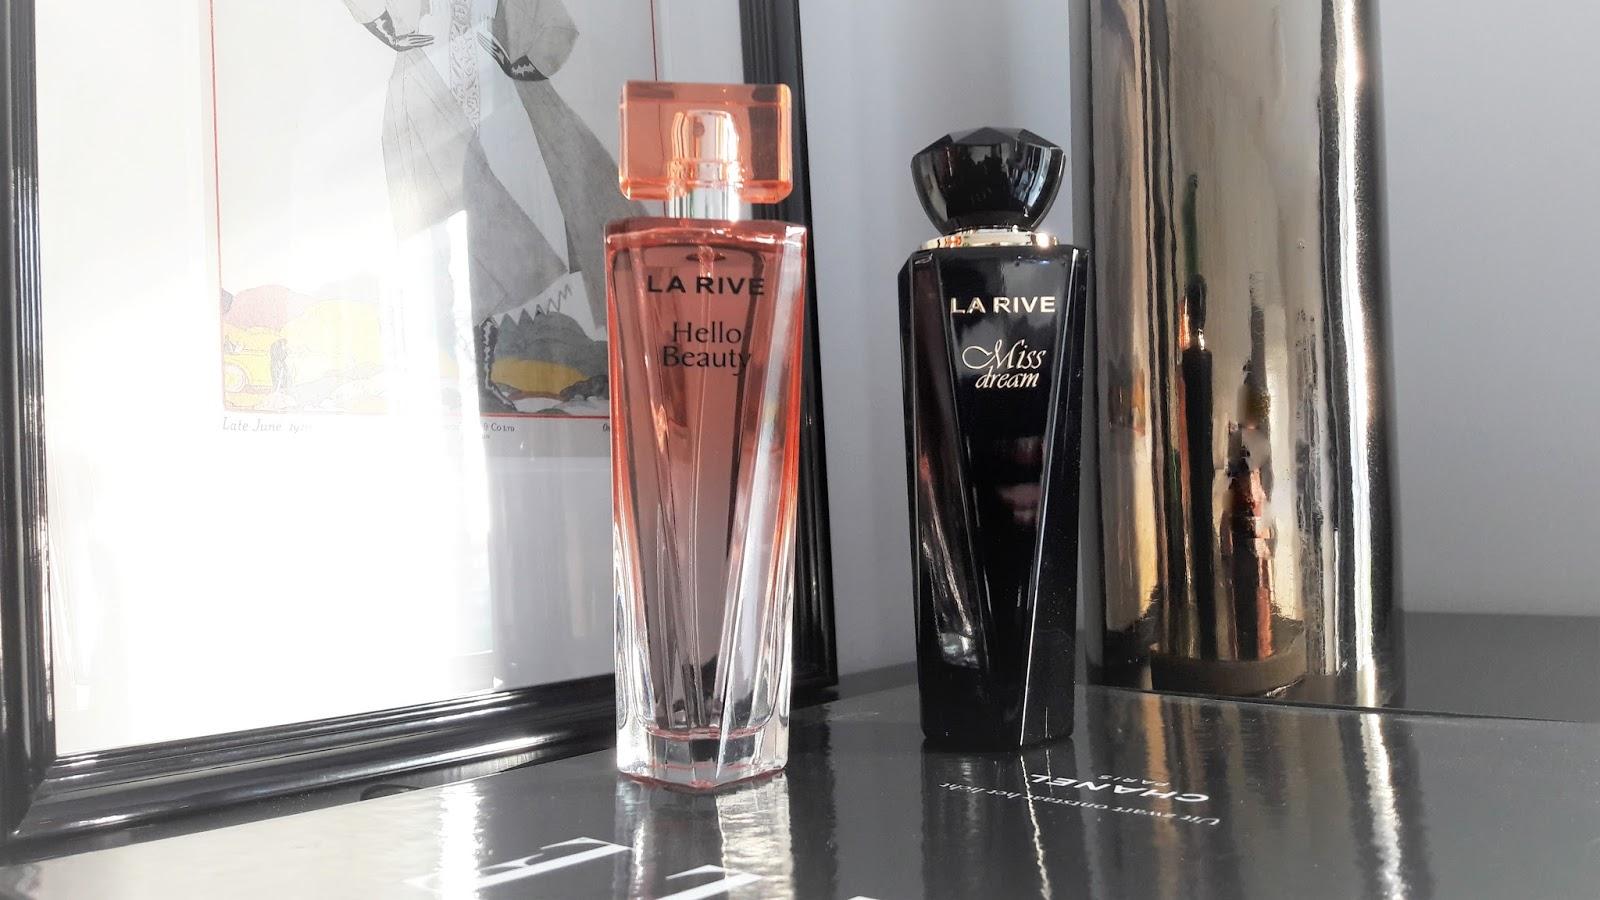 Marketstreet 79 La Rive Parfums Miss Dream Review Hello Beauty Review